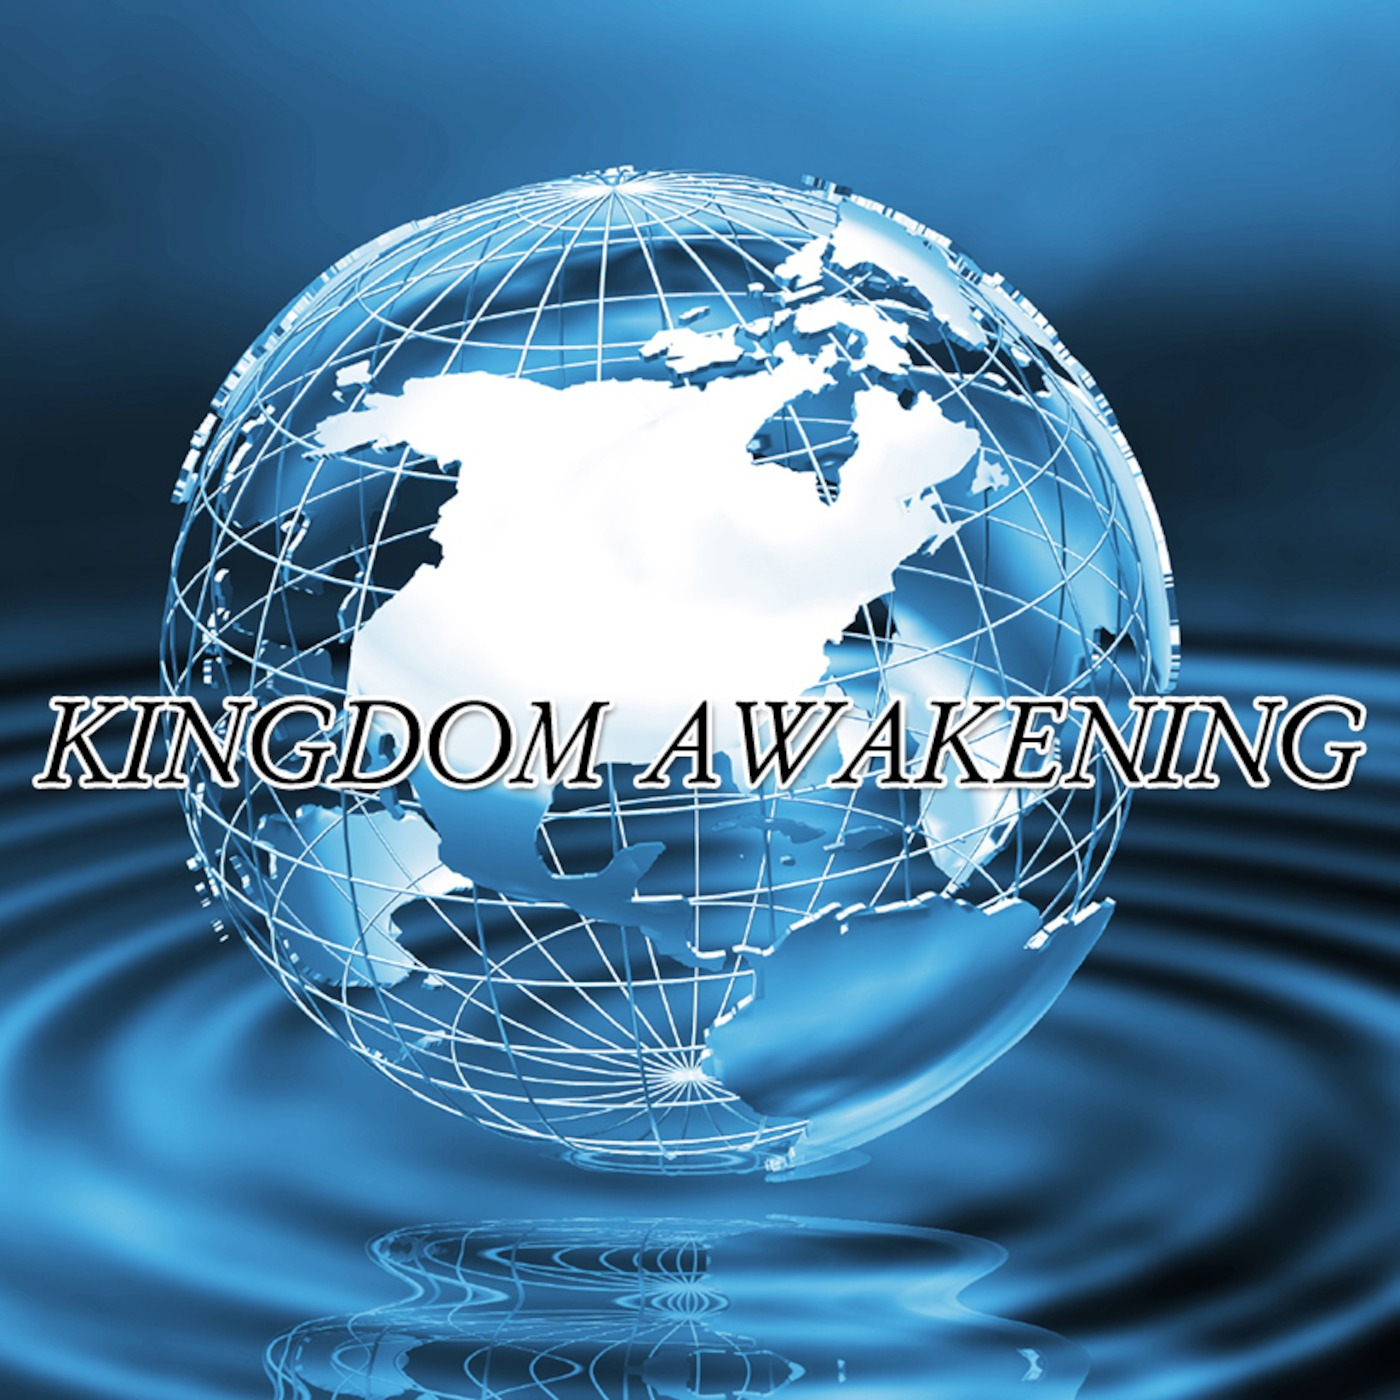 Kingdom Awakening